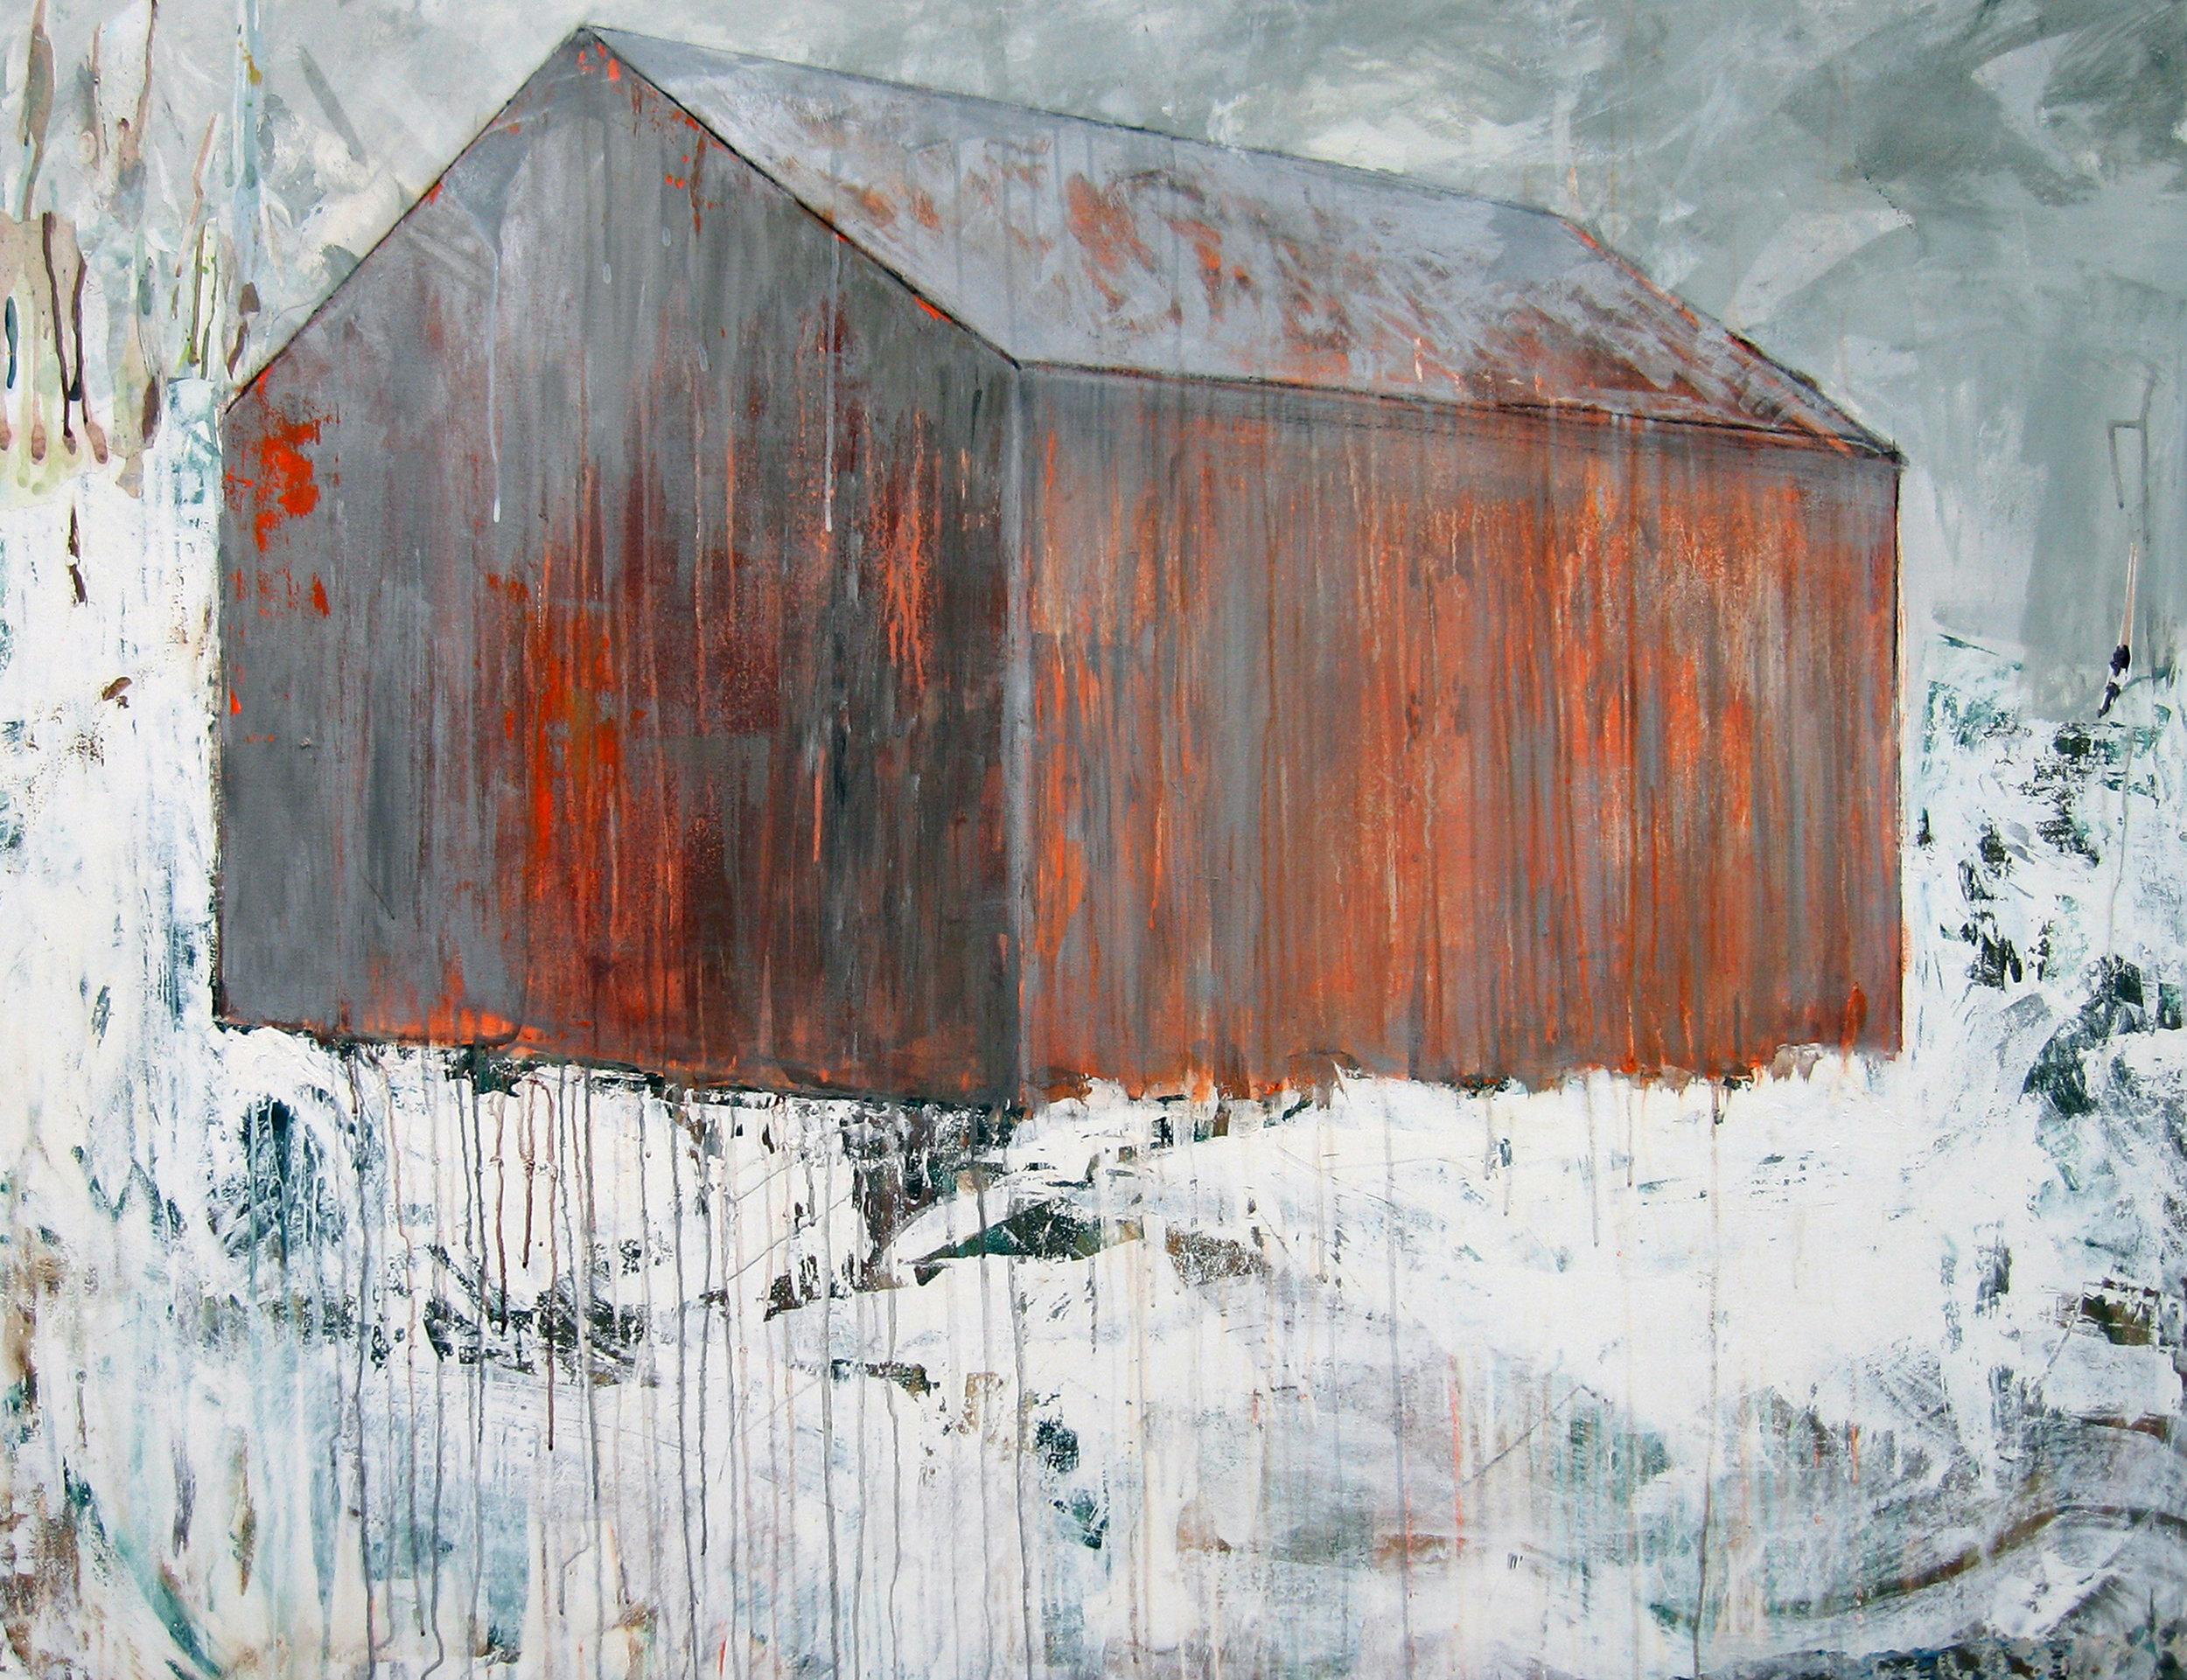 Brenda Cirioni,  Barn Series: Answer Note, Mixed media painting, 36x48